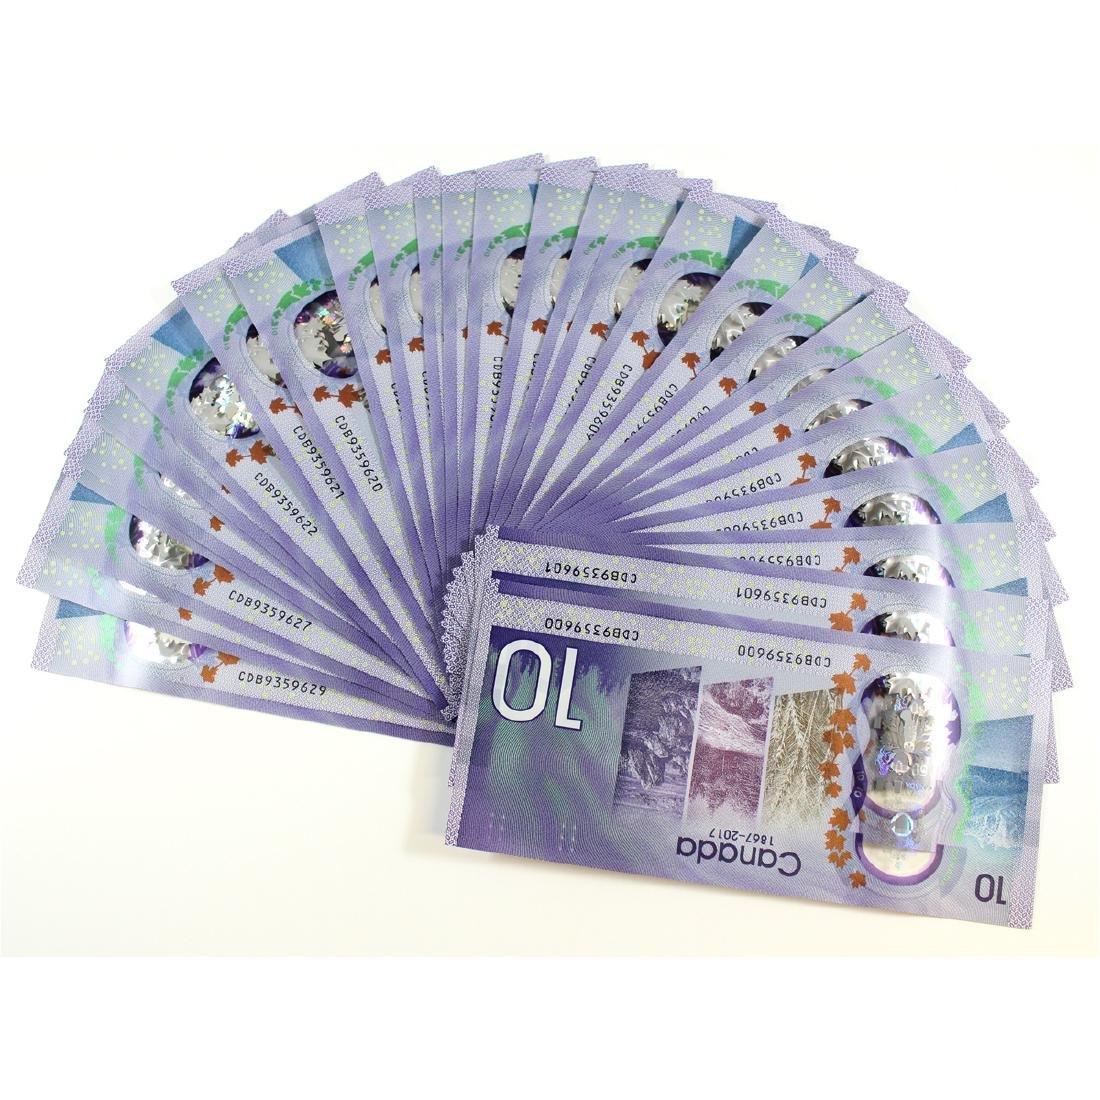 30 x 2017 commemorative $10.00 notes with CDB prefix